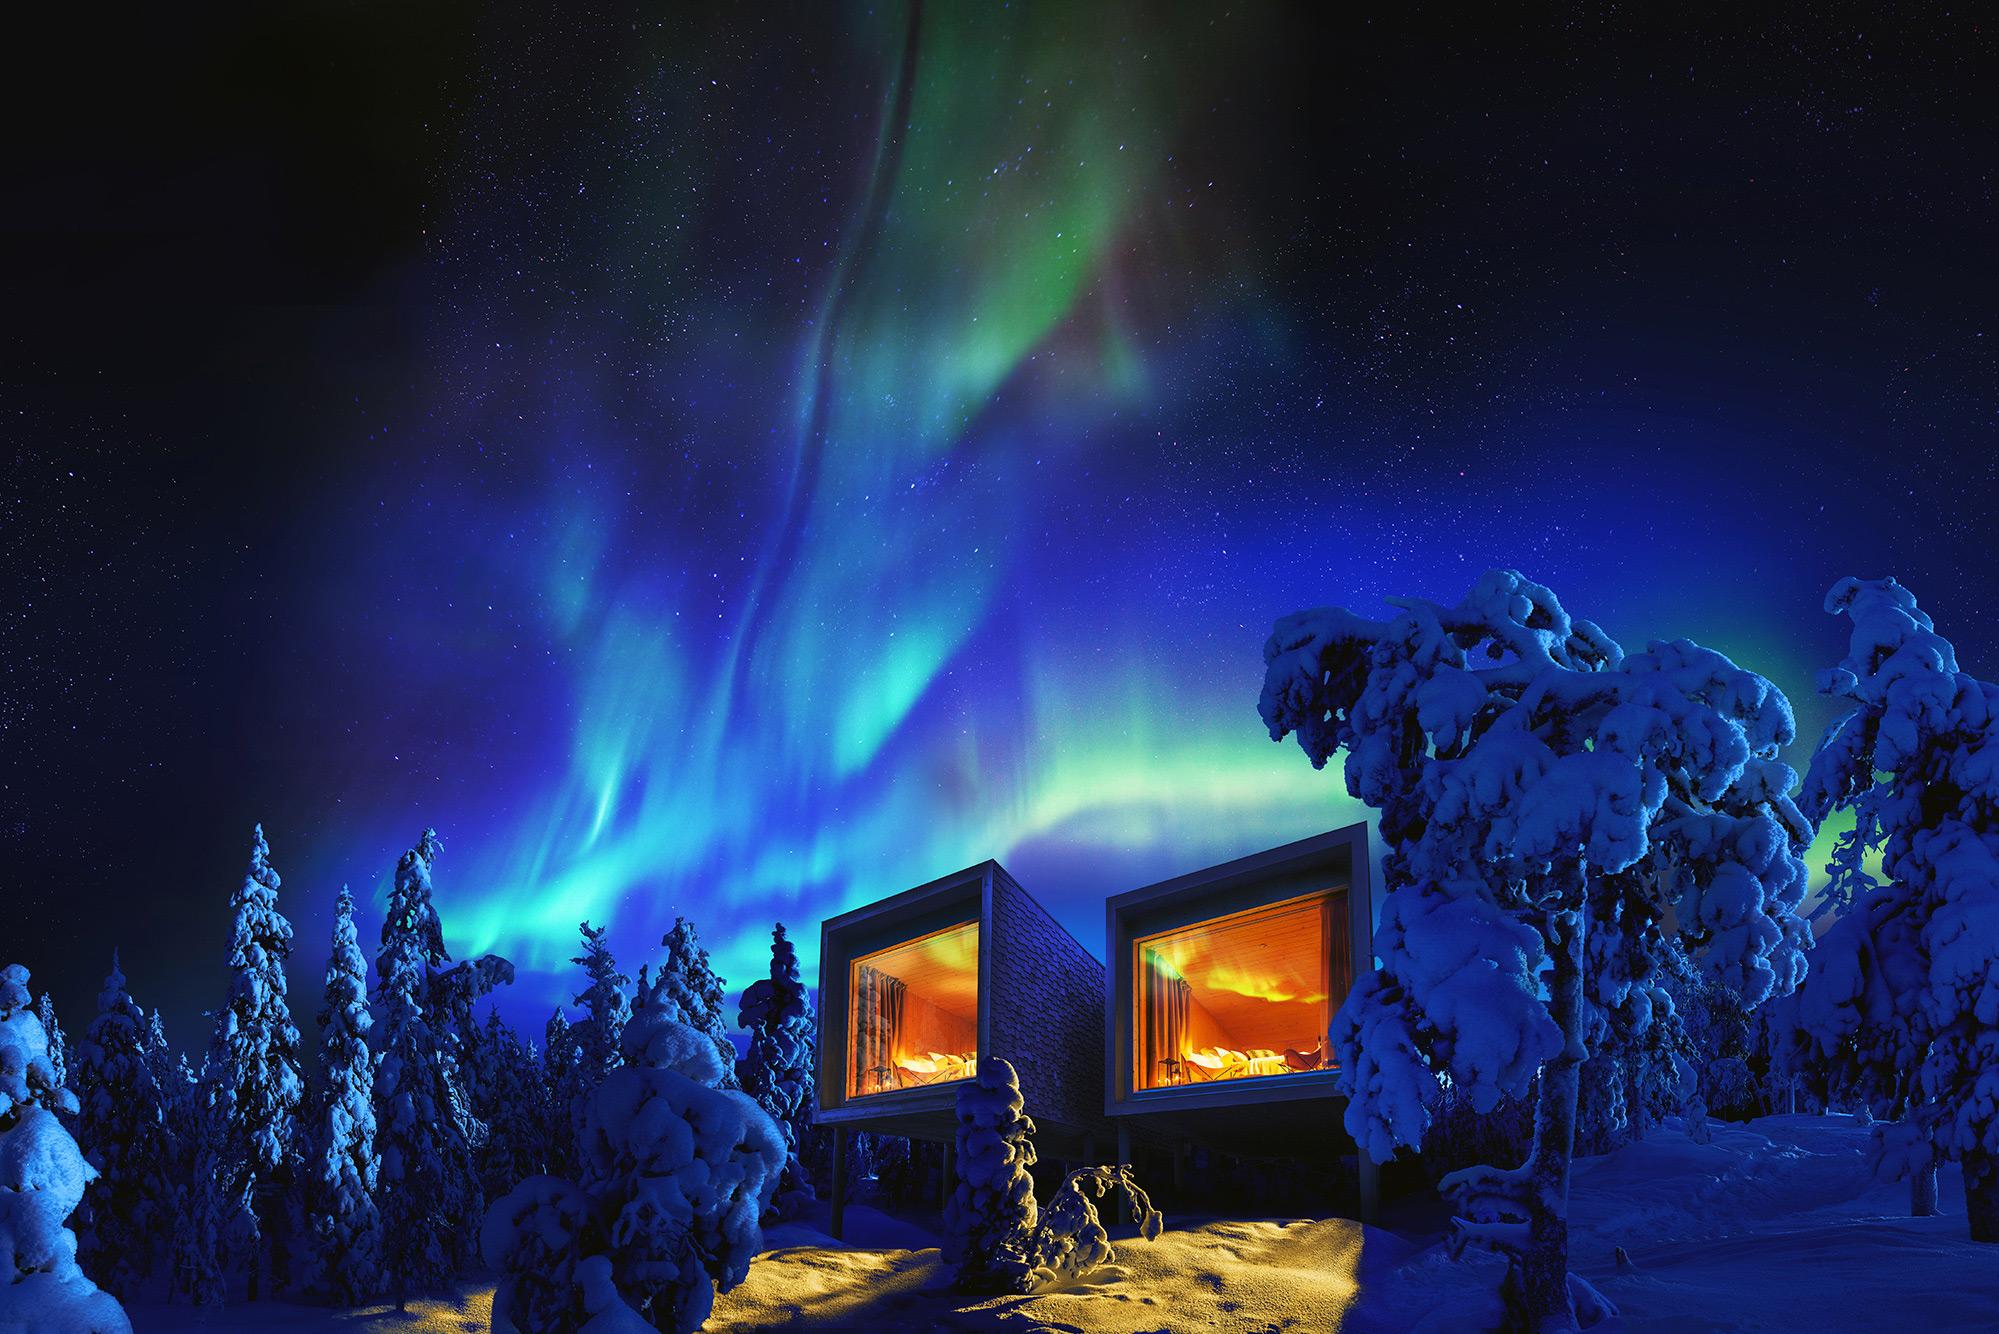 Artic-tre-finland-magazinehorse